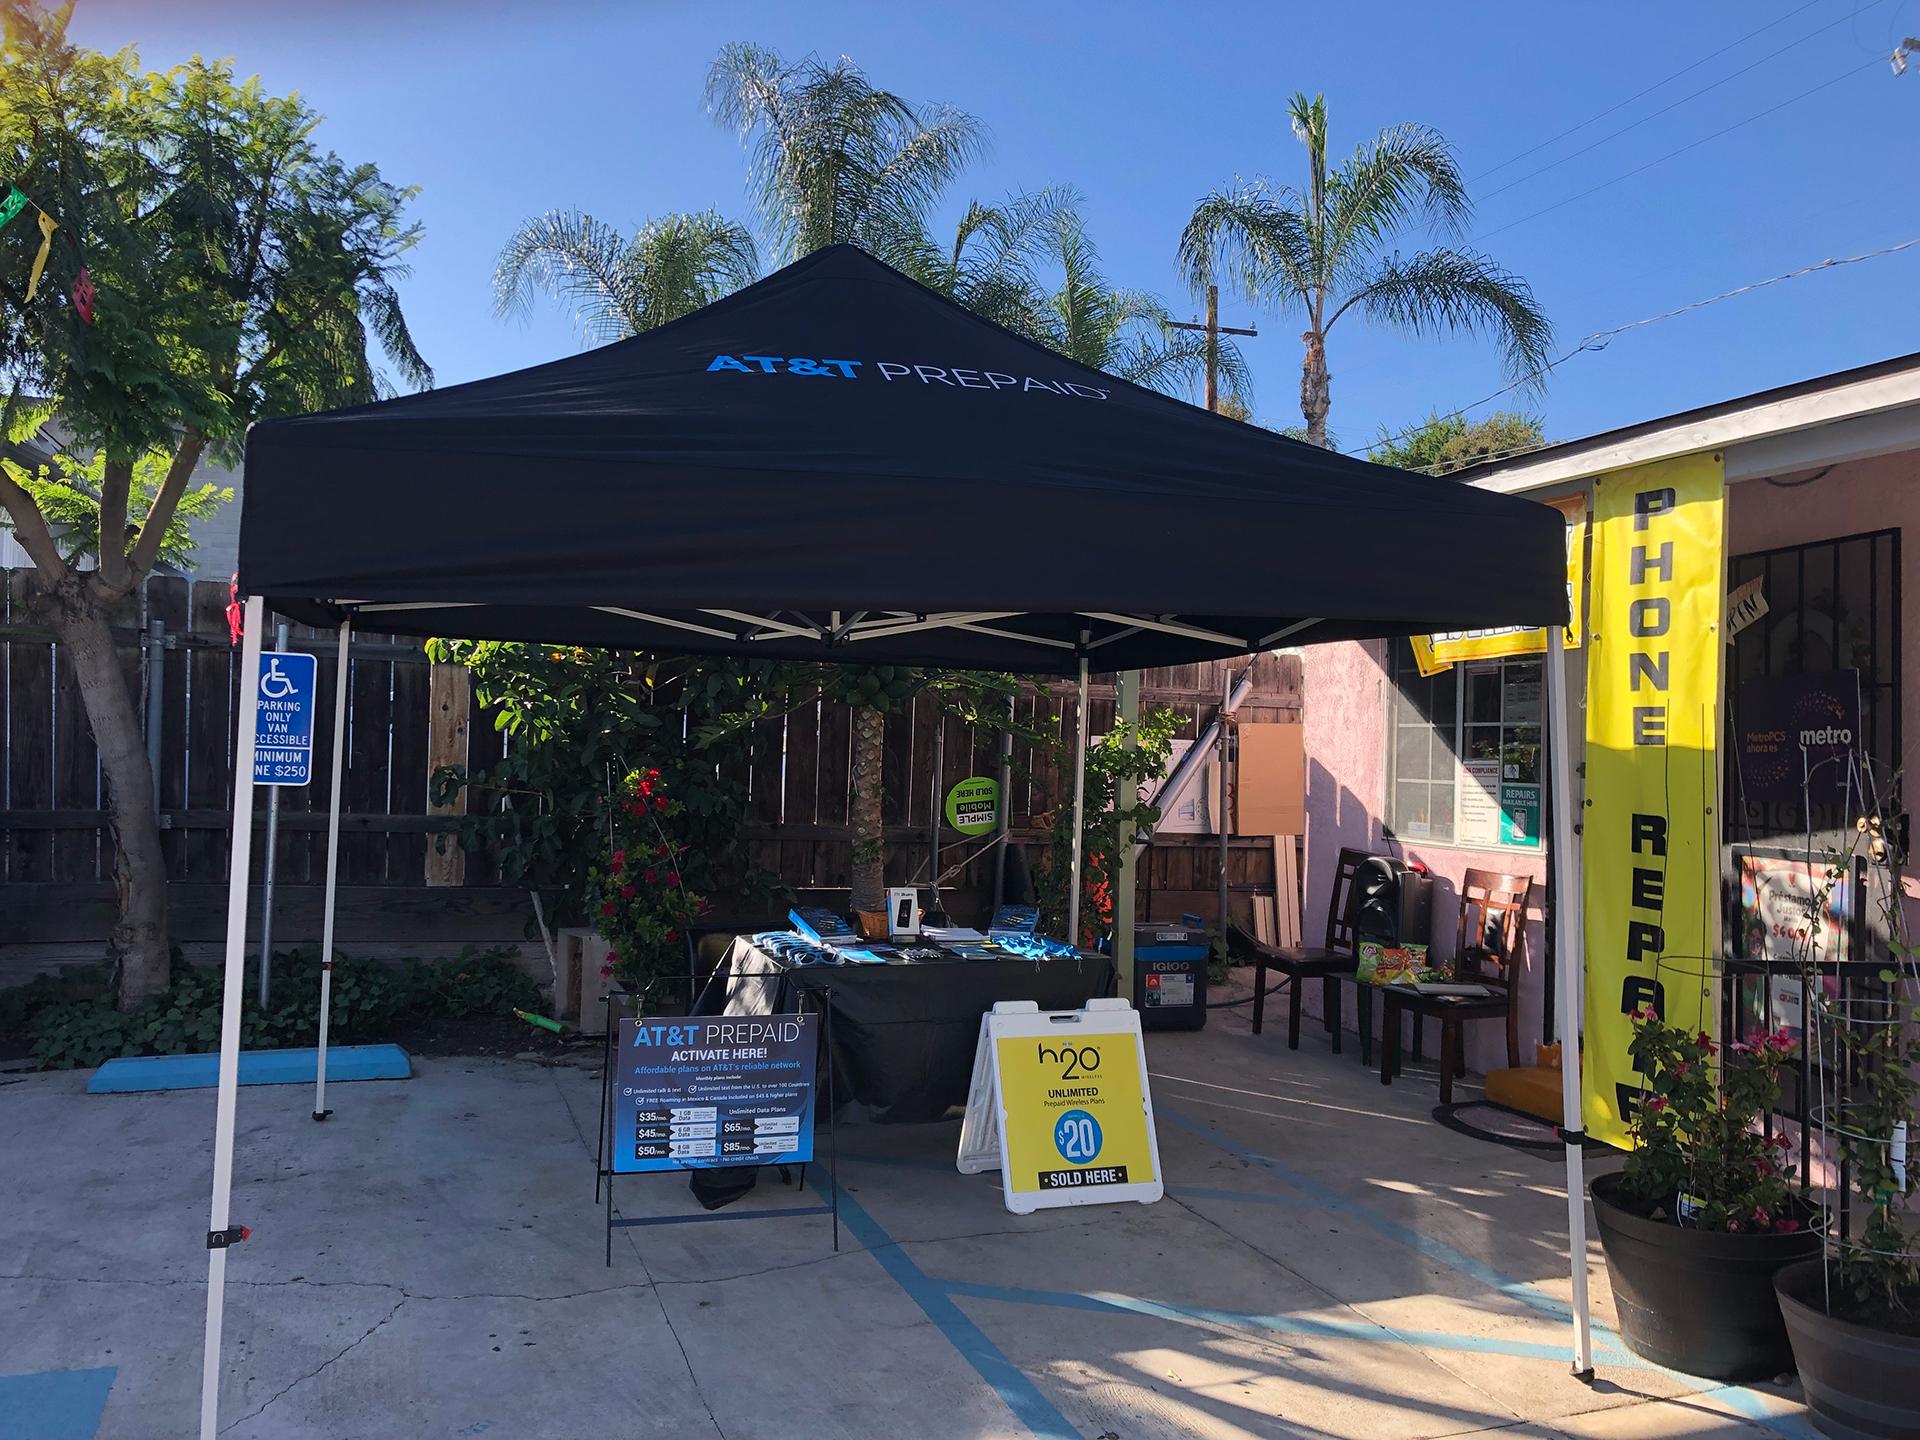 Empower Retailer Solutions Wireless Dealer promo events